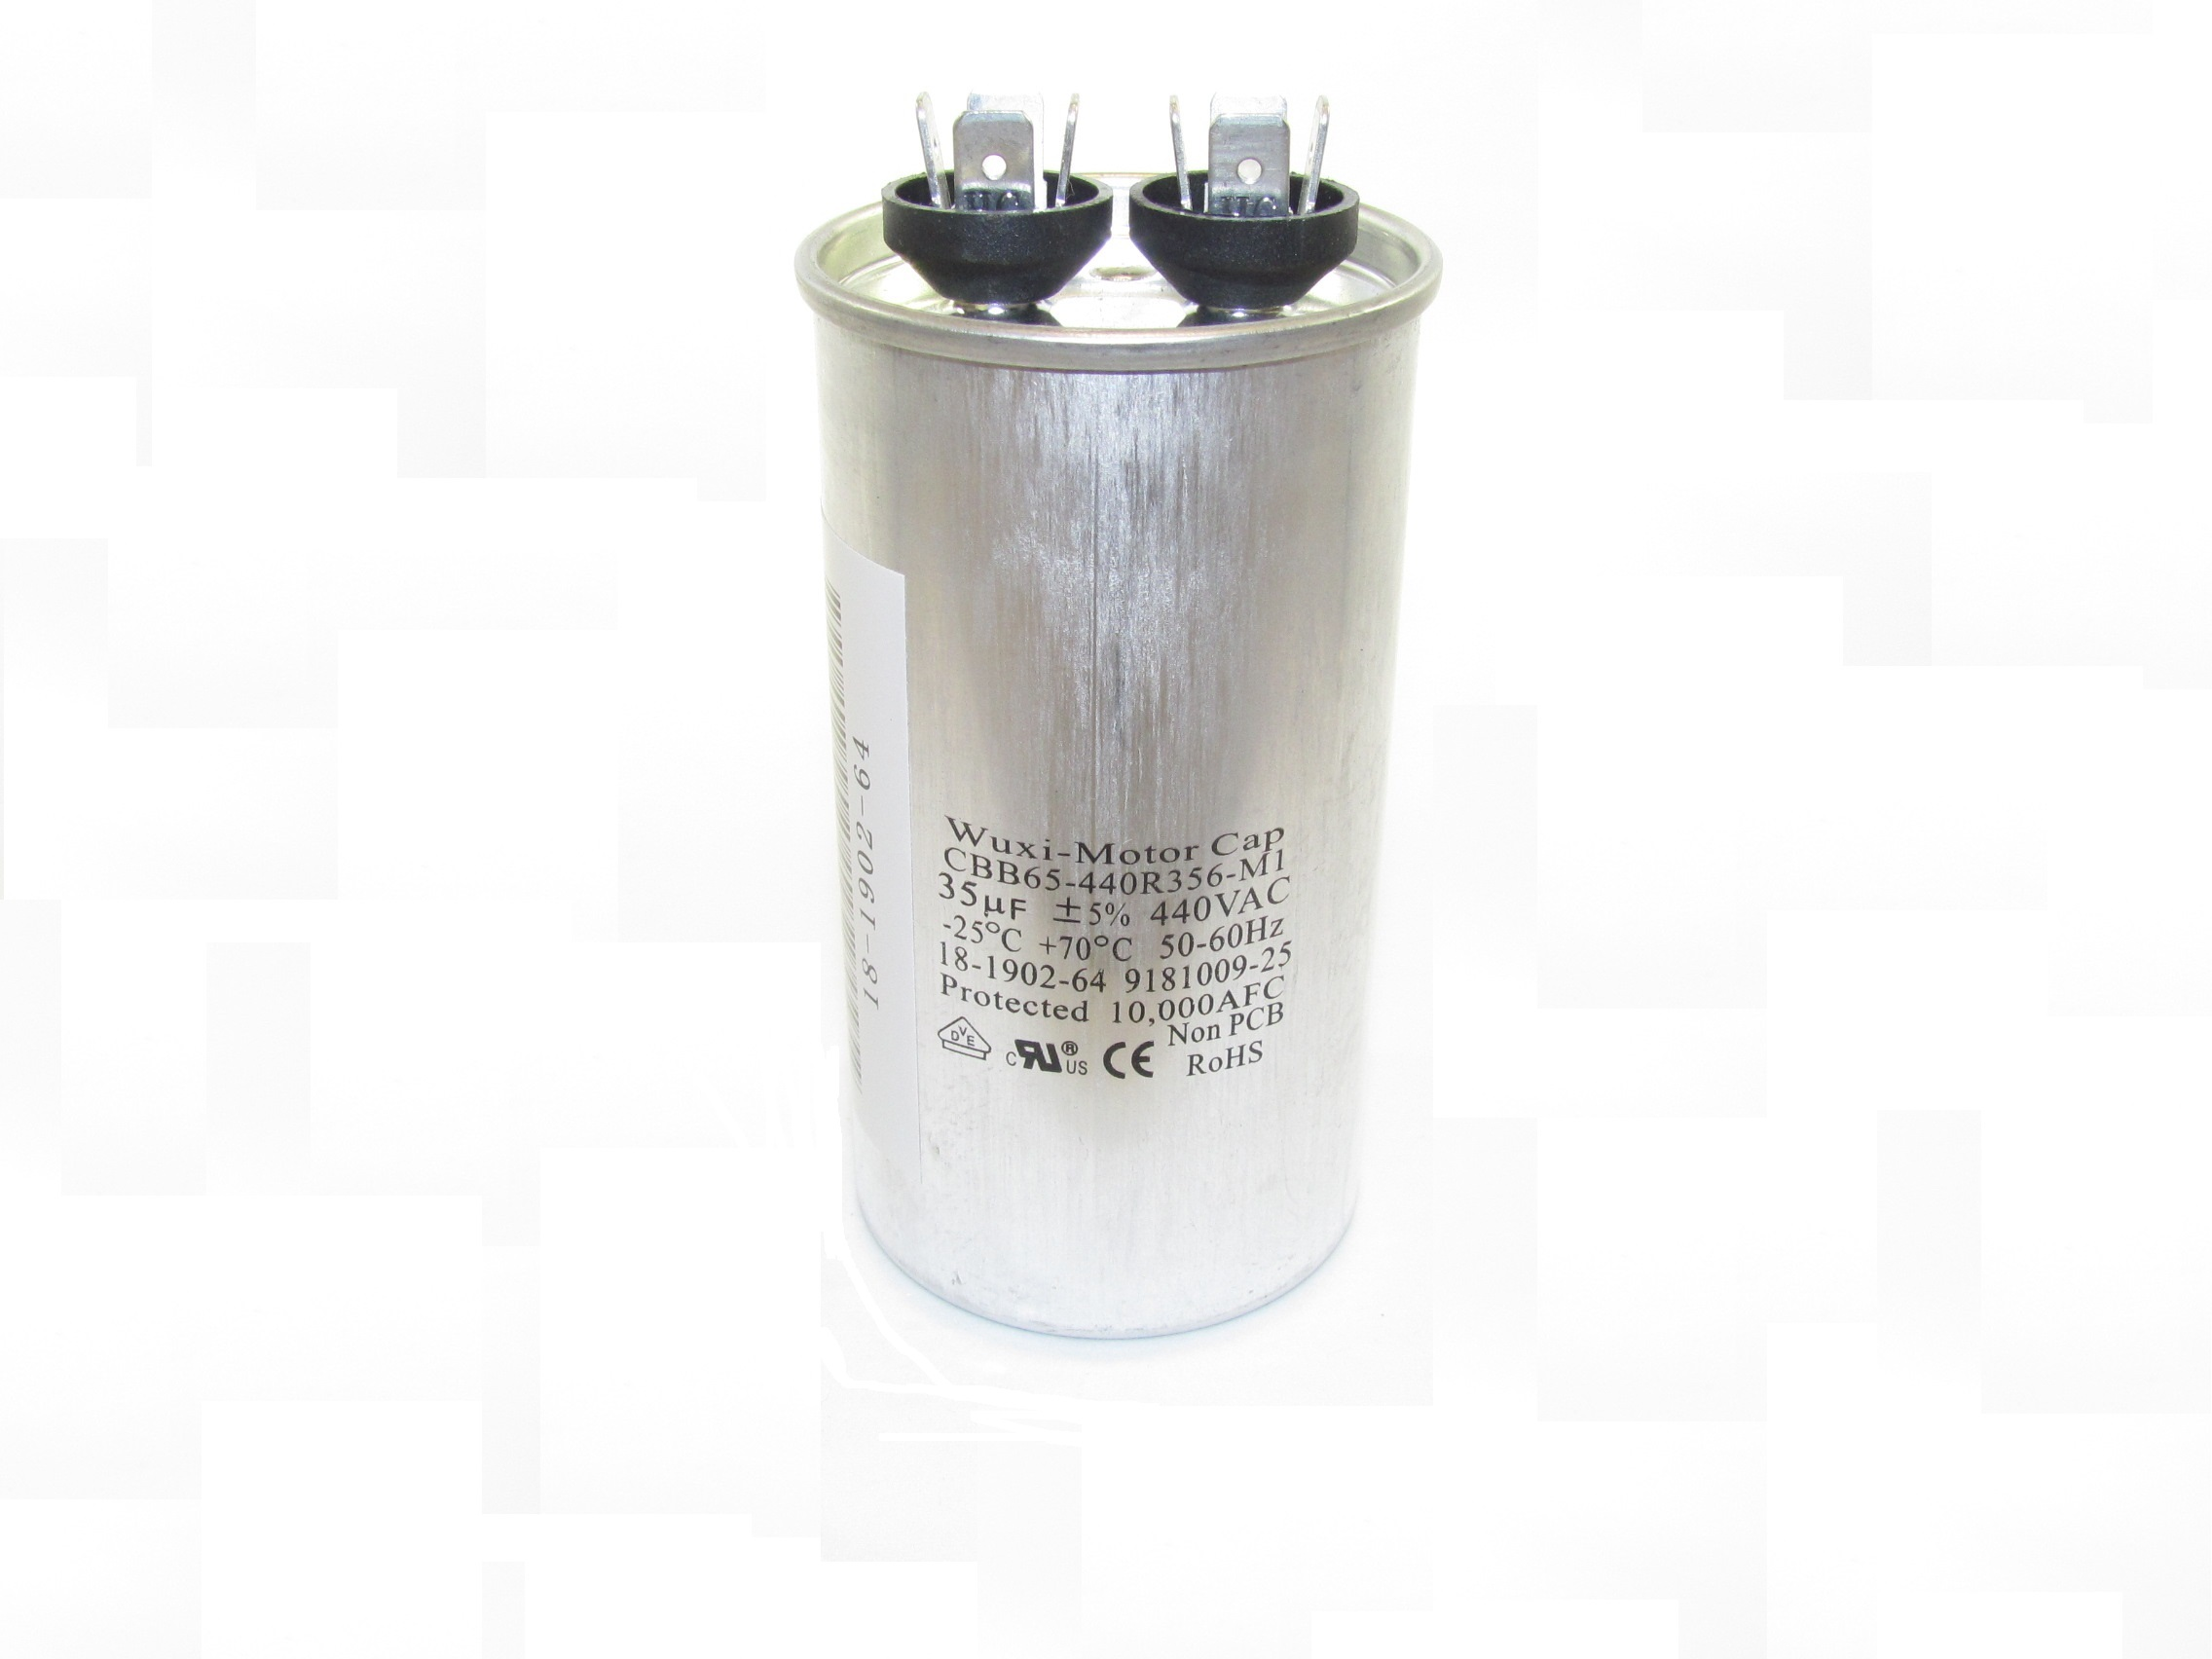 CBB65 Motor Run Capacitors (Round-Shaped, Single Capacitance Value)